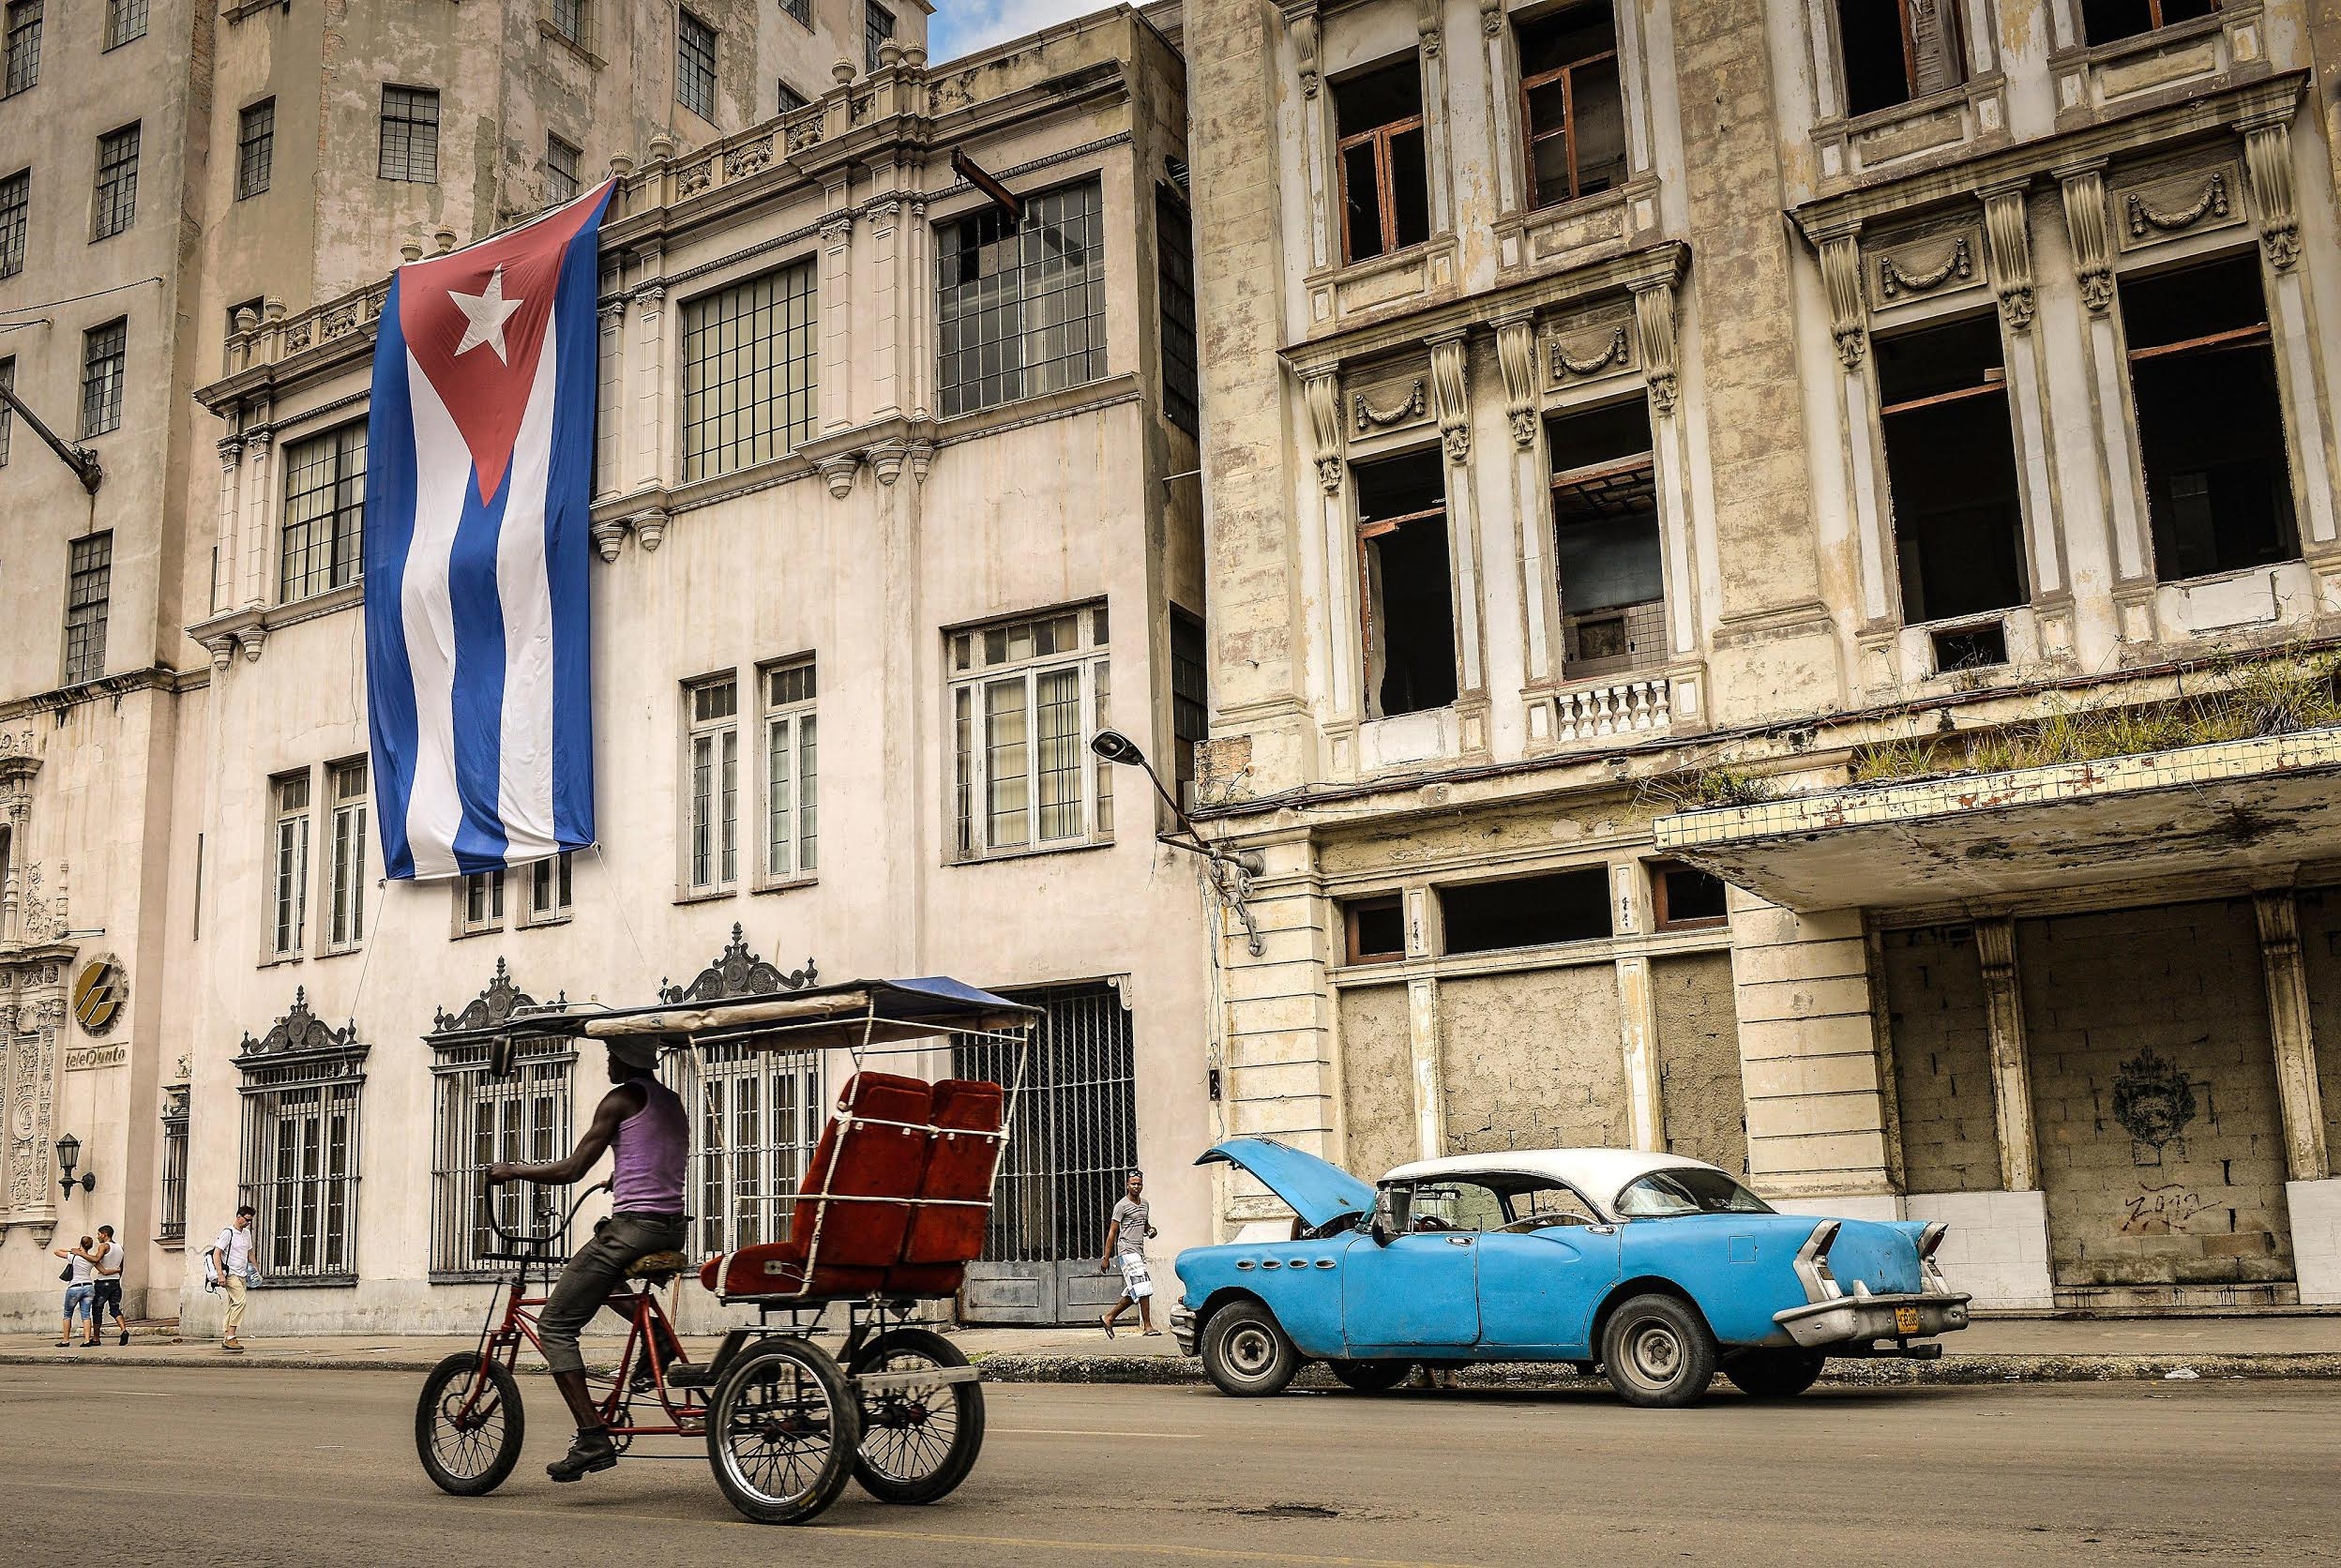 IS CUBA ON YOUR BUCKET LIST?